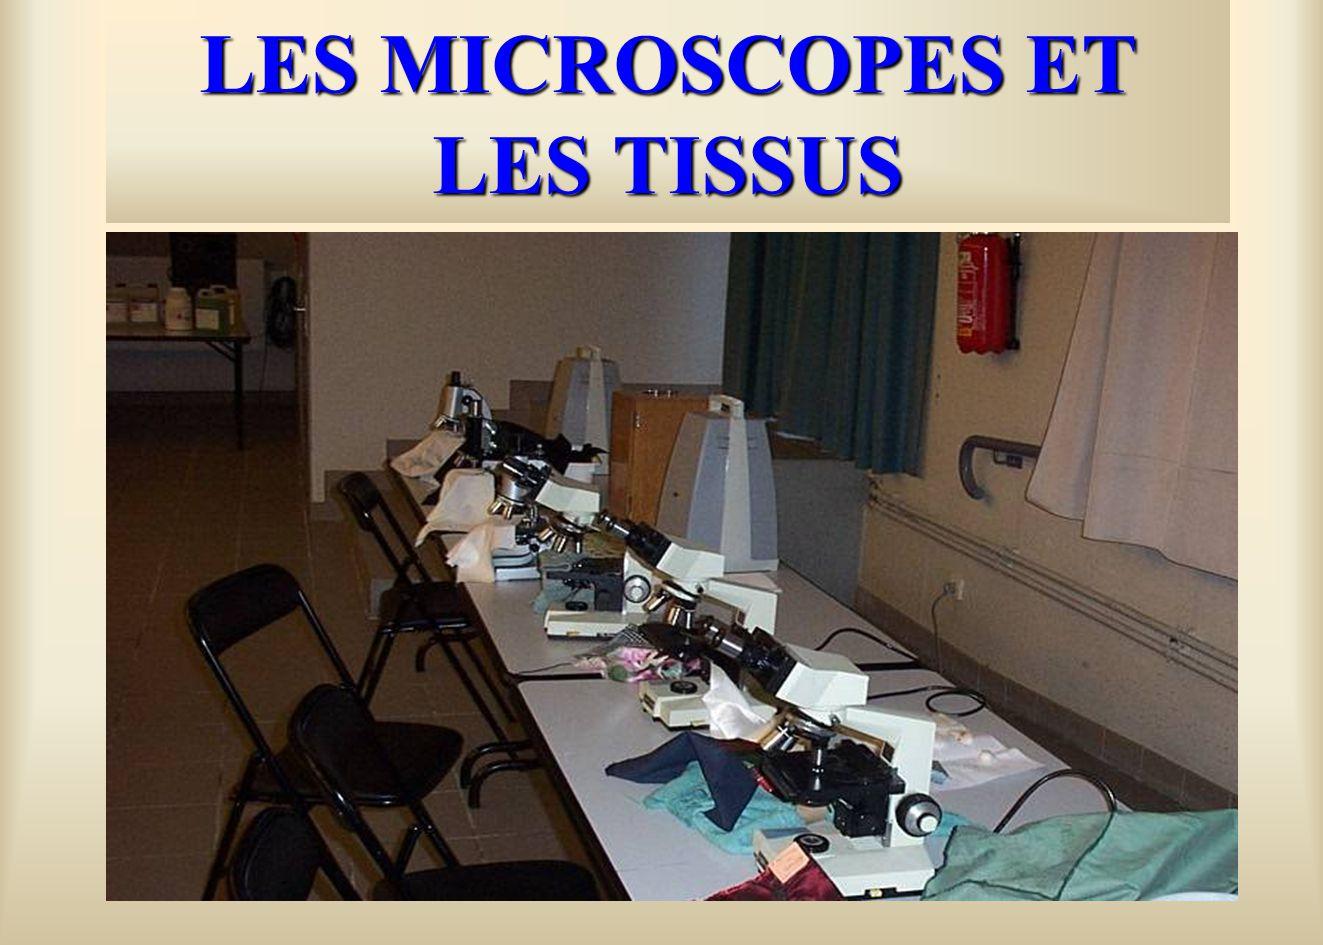 LES MICROSCOPES ET LES TISSUS